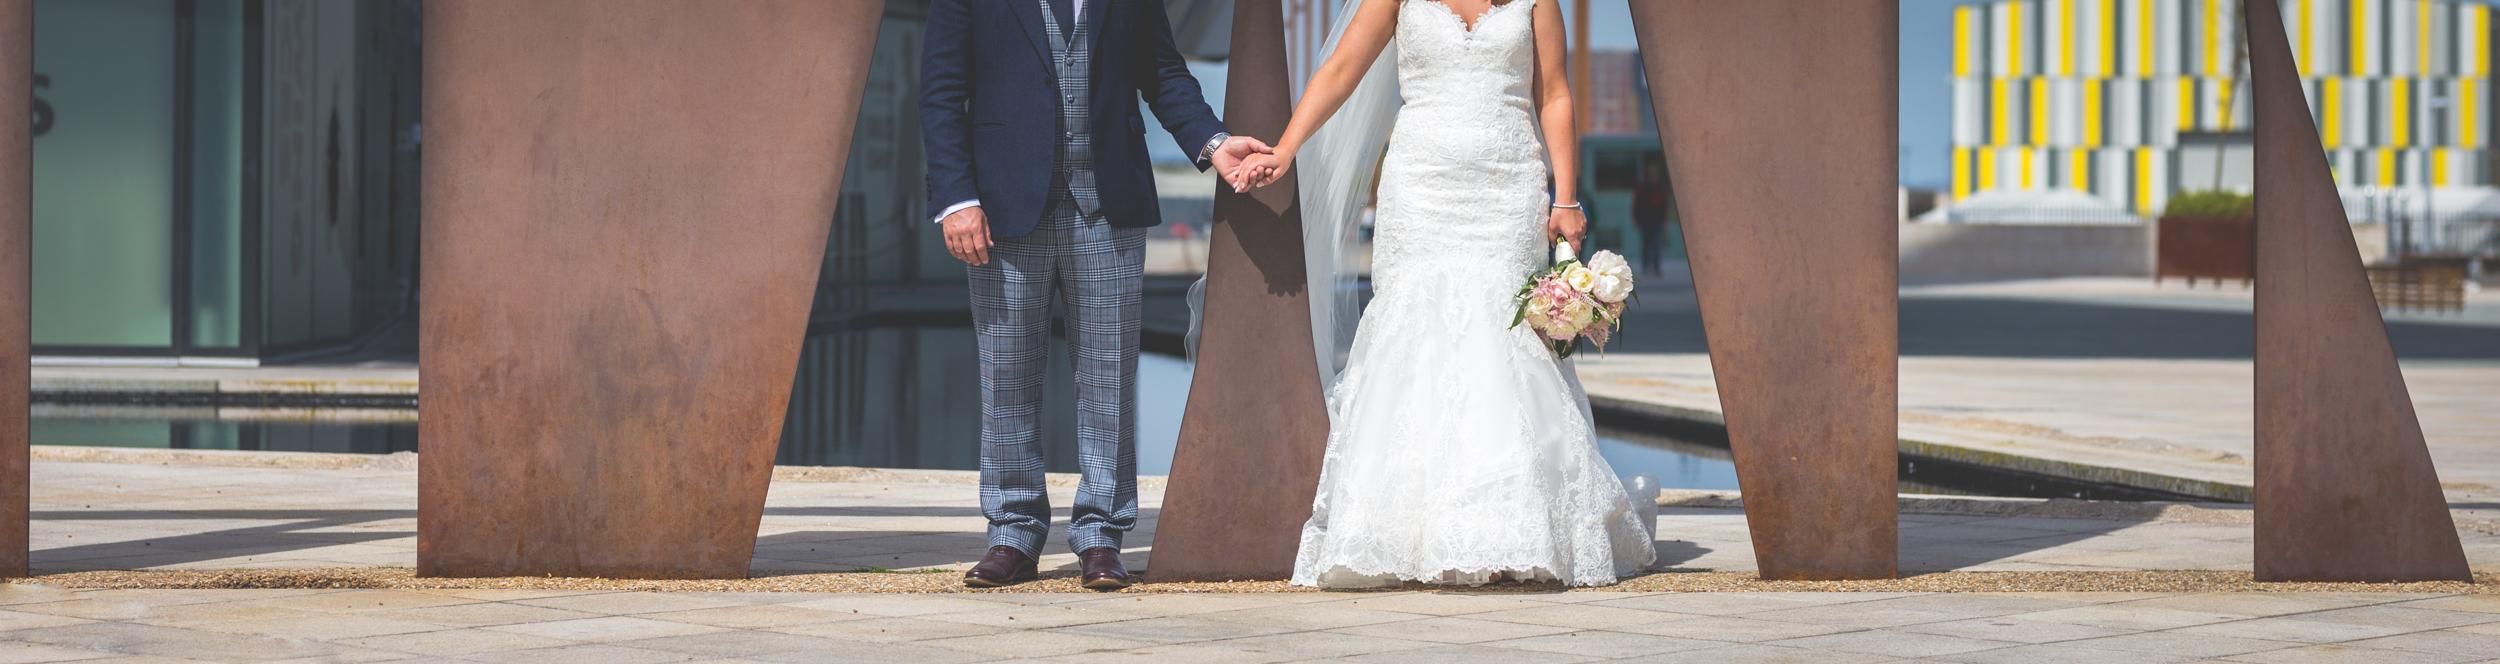 Brian McEwan   Northern Ireland Wedding Photographer   Rebecca & Michael   Portraits-74.jpg